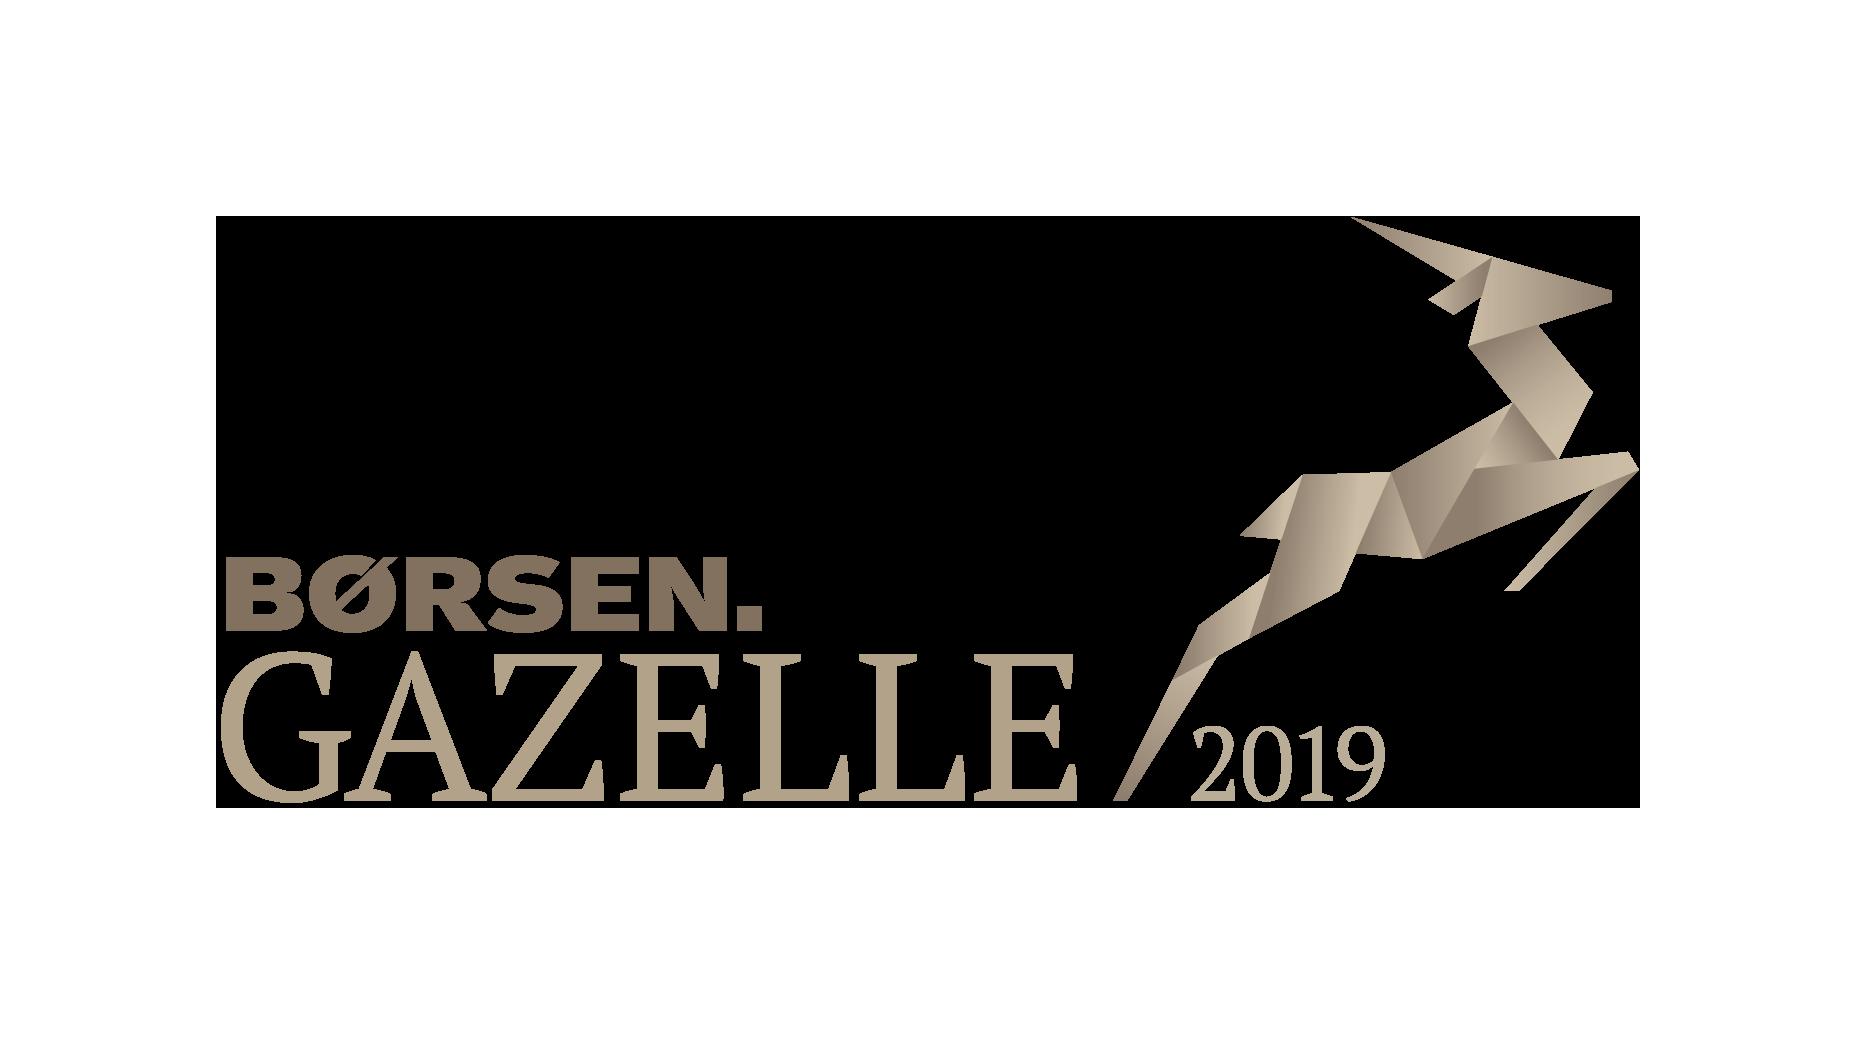 Publico er Børsen Gazelle 2019